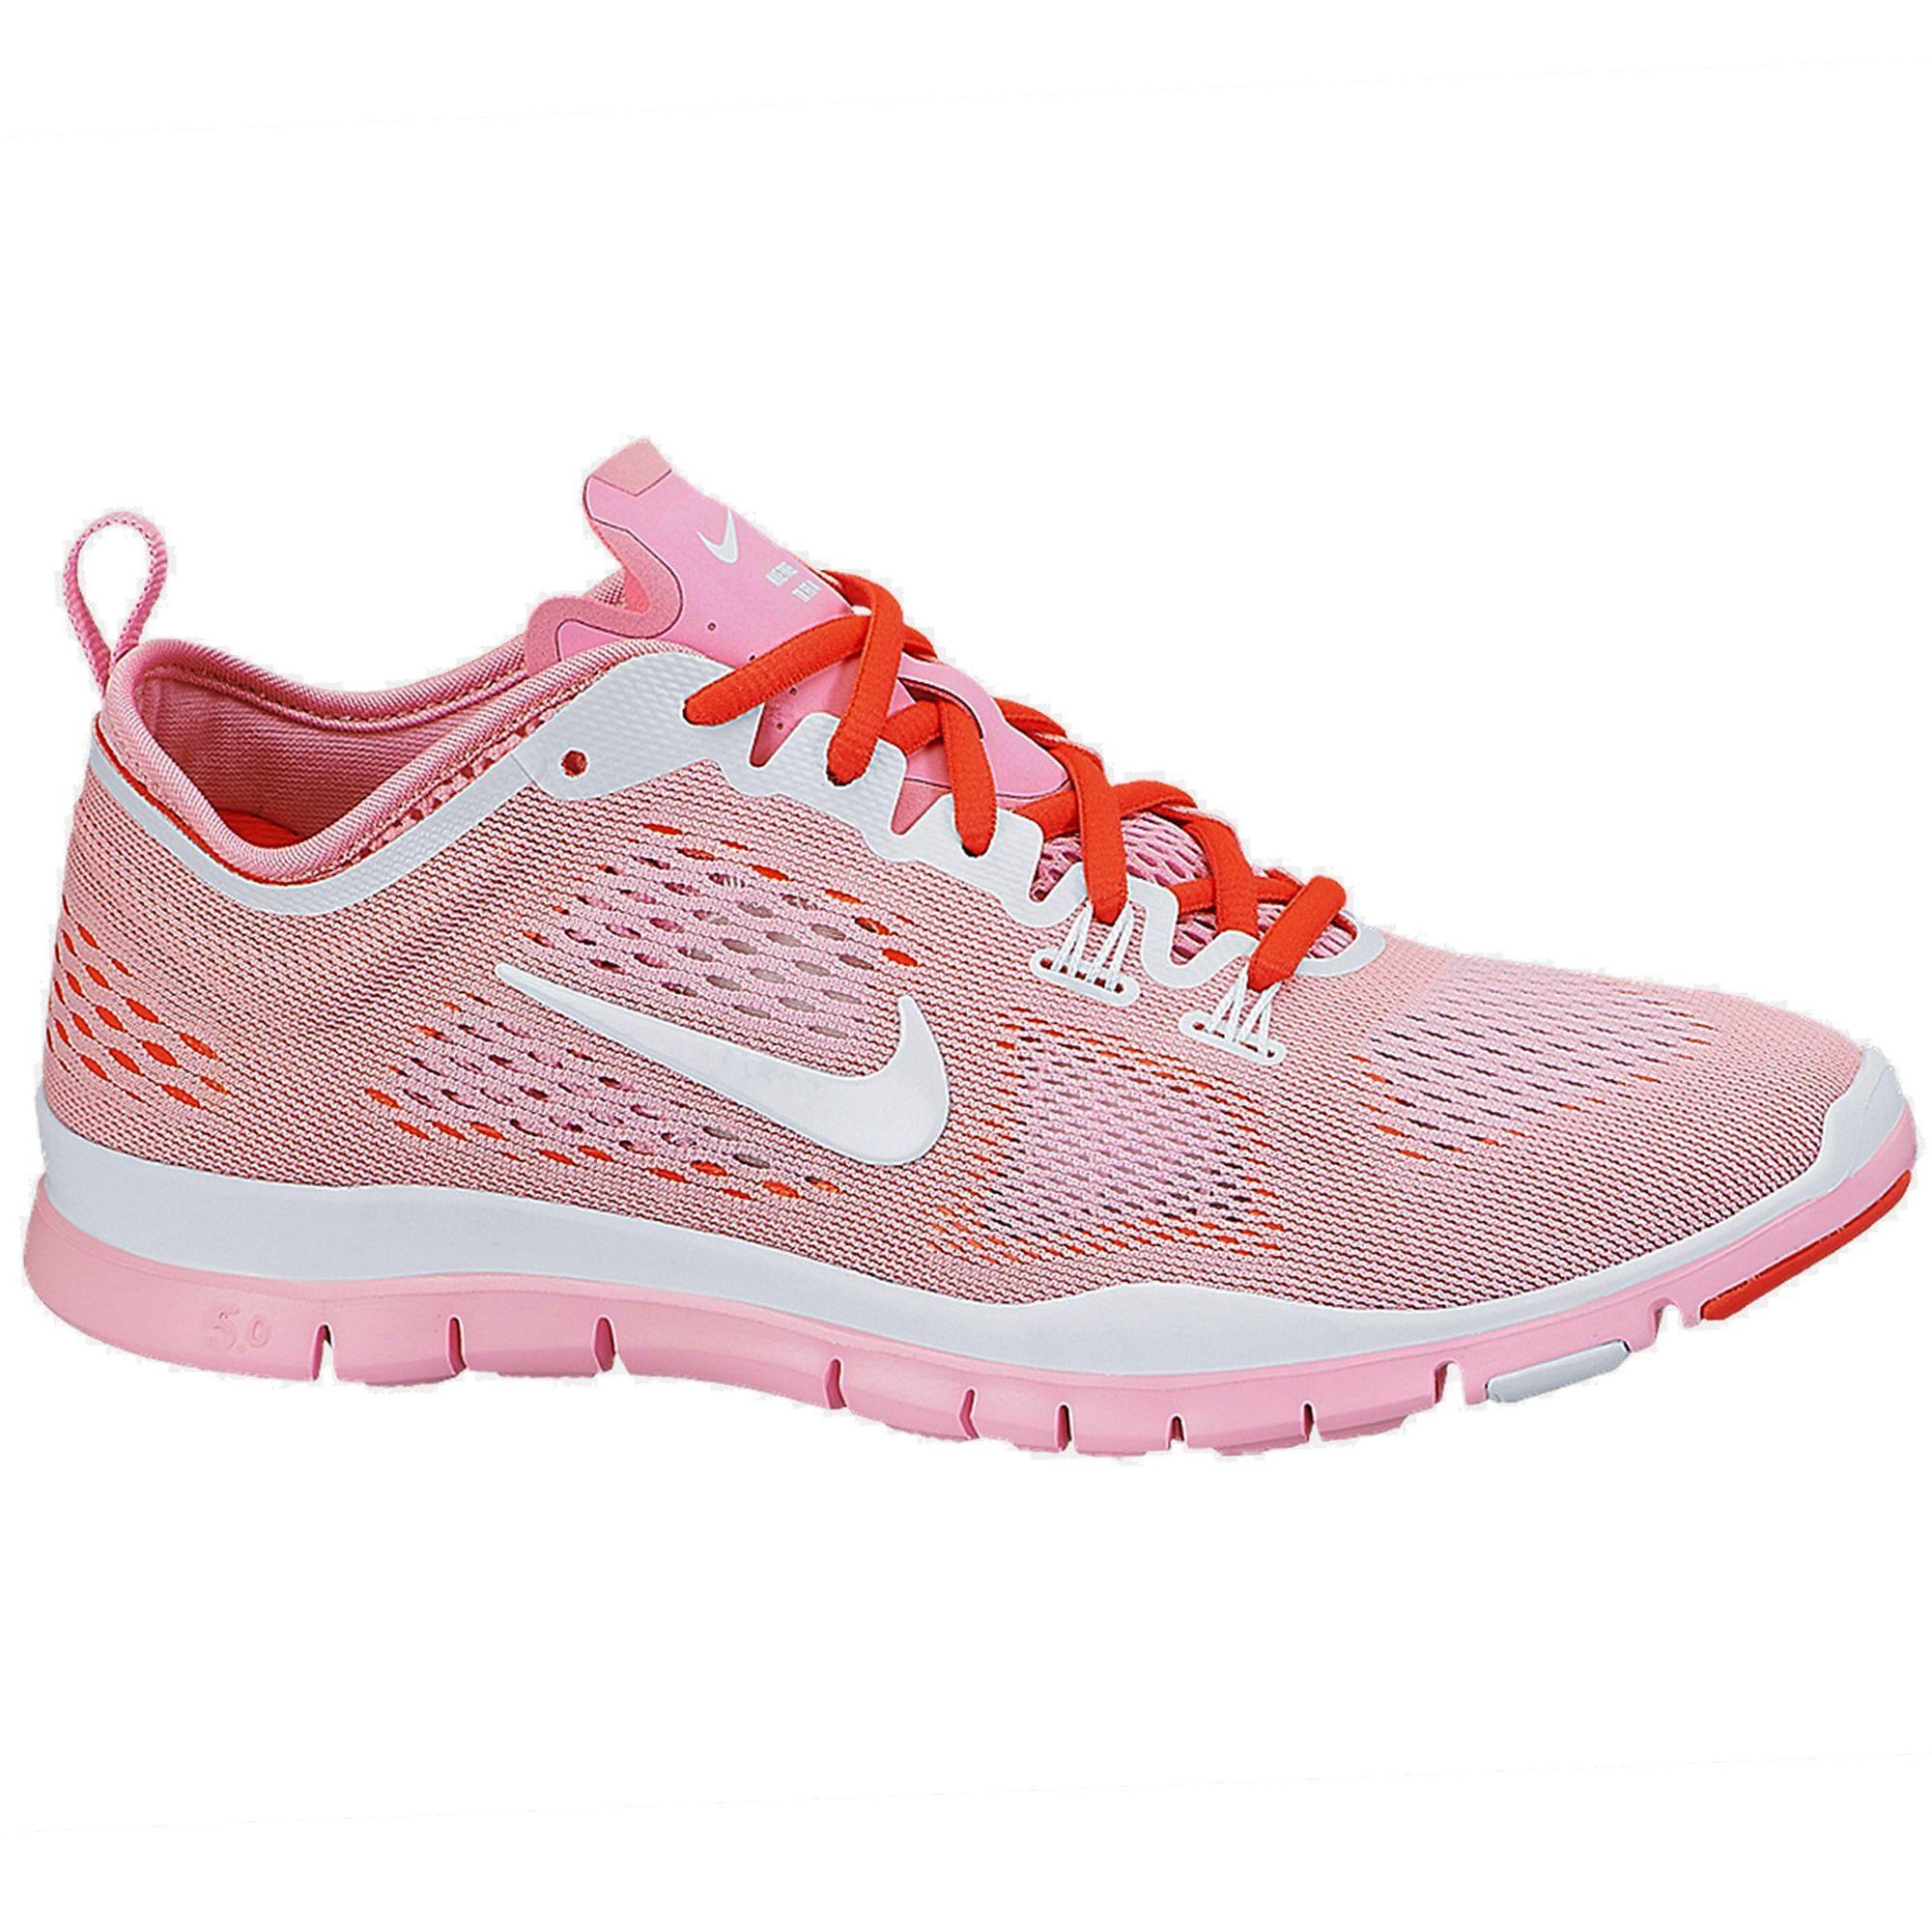 nike free 5.0 tr fit 4 breath spor ayakkabılar